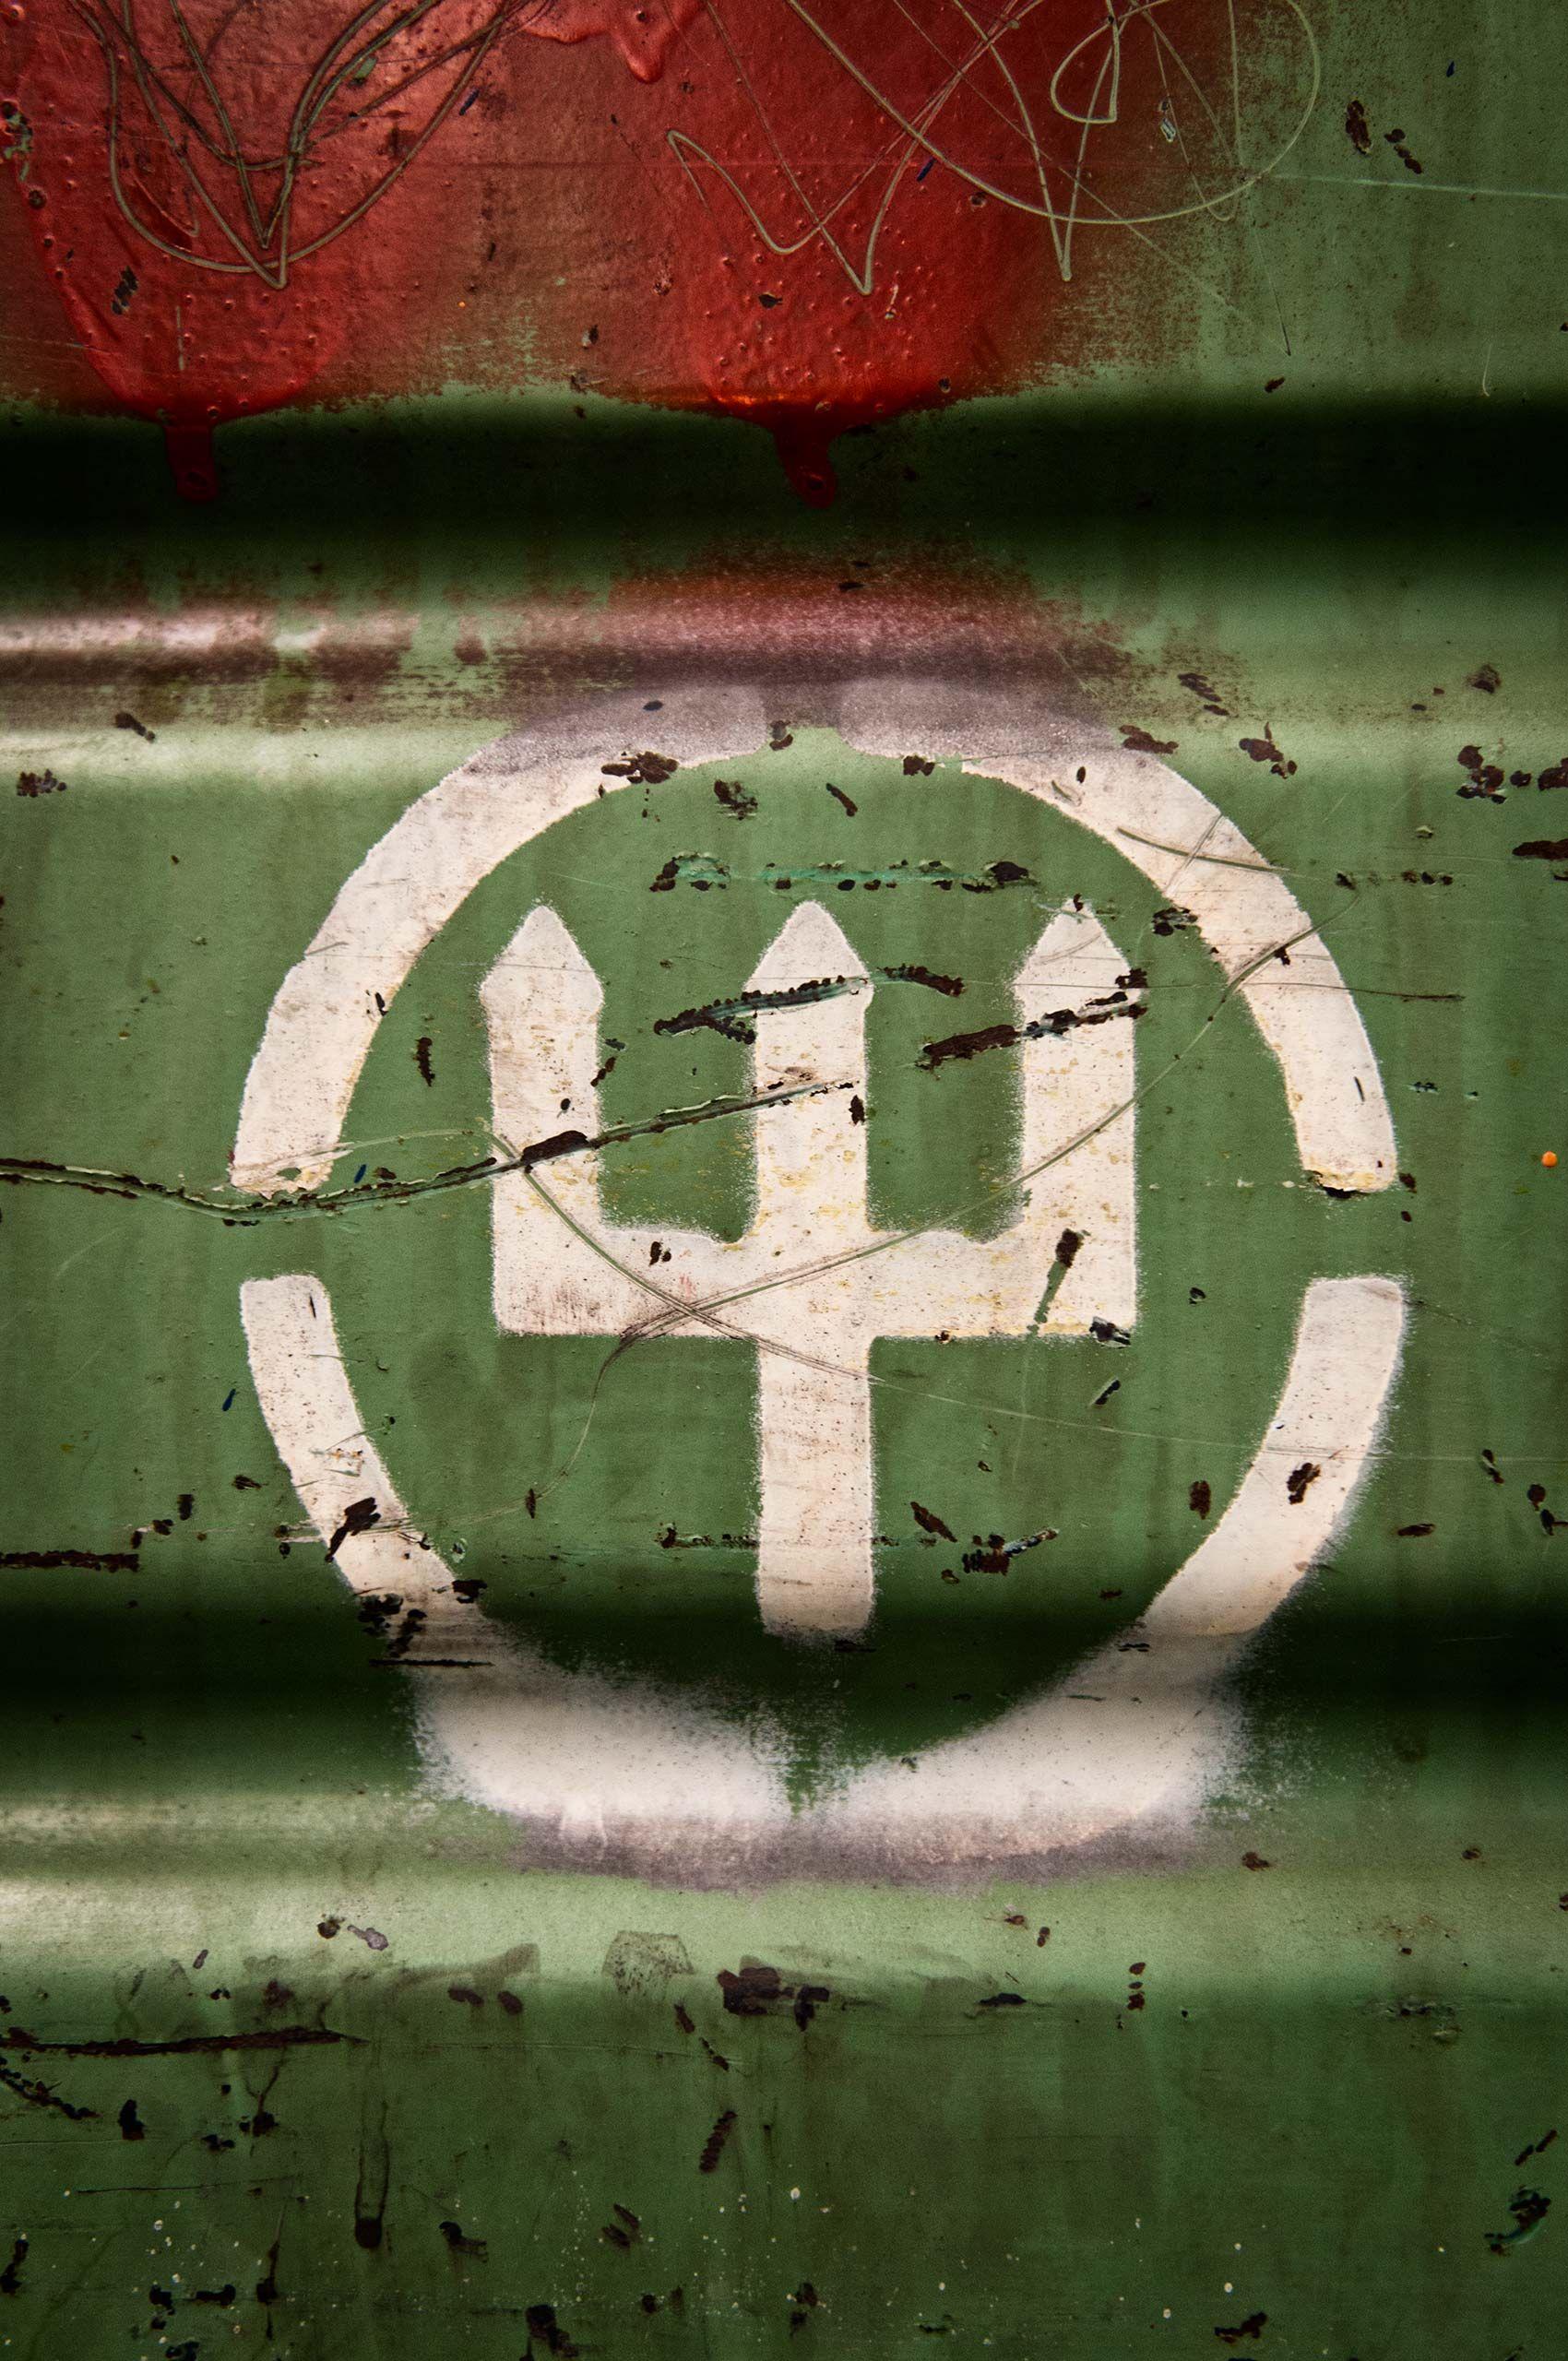 logo-on-crate-wusthof-factory-HenrikOlundPhotography..jpg